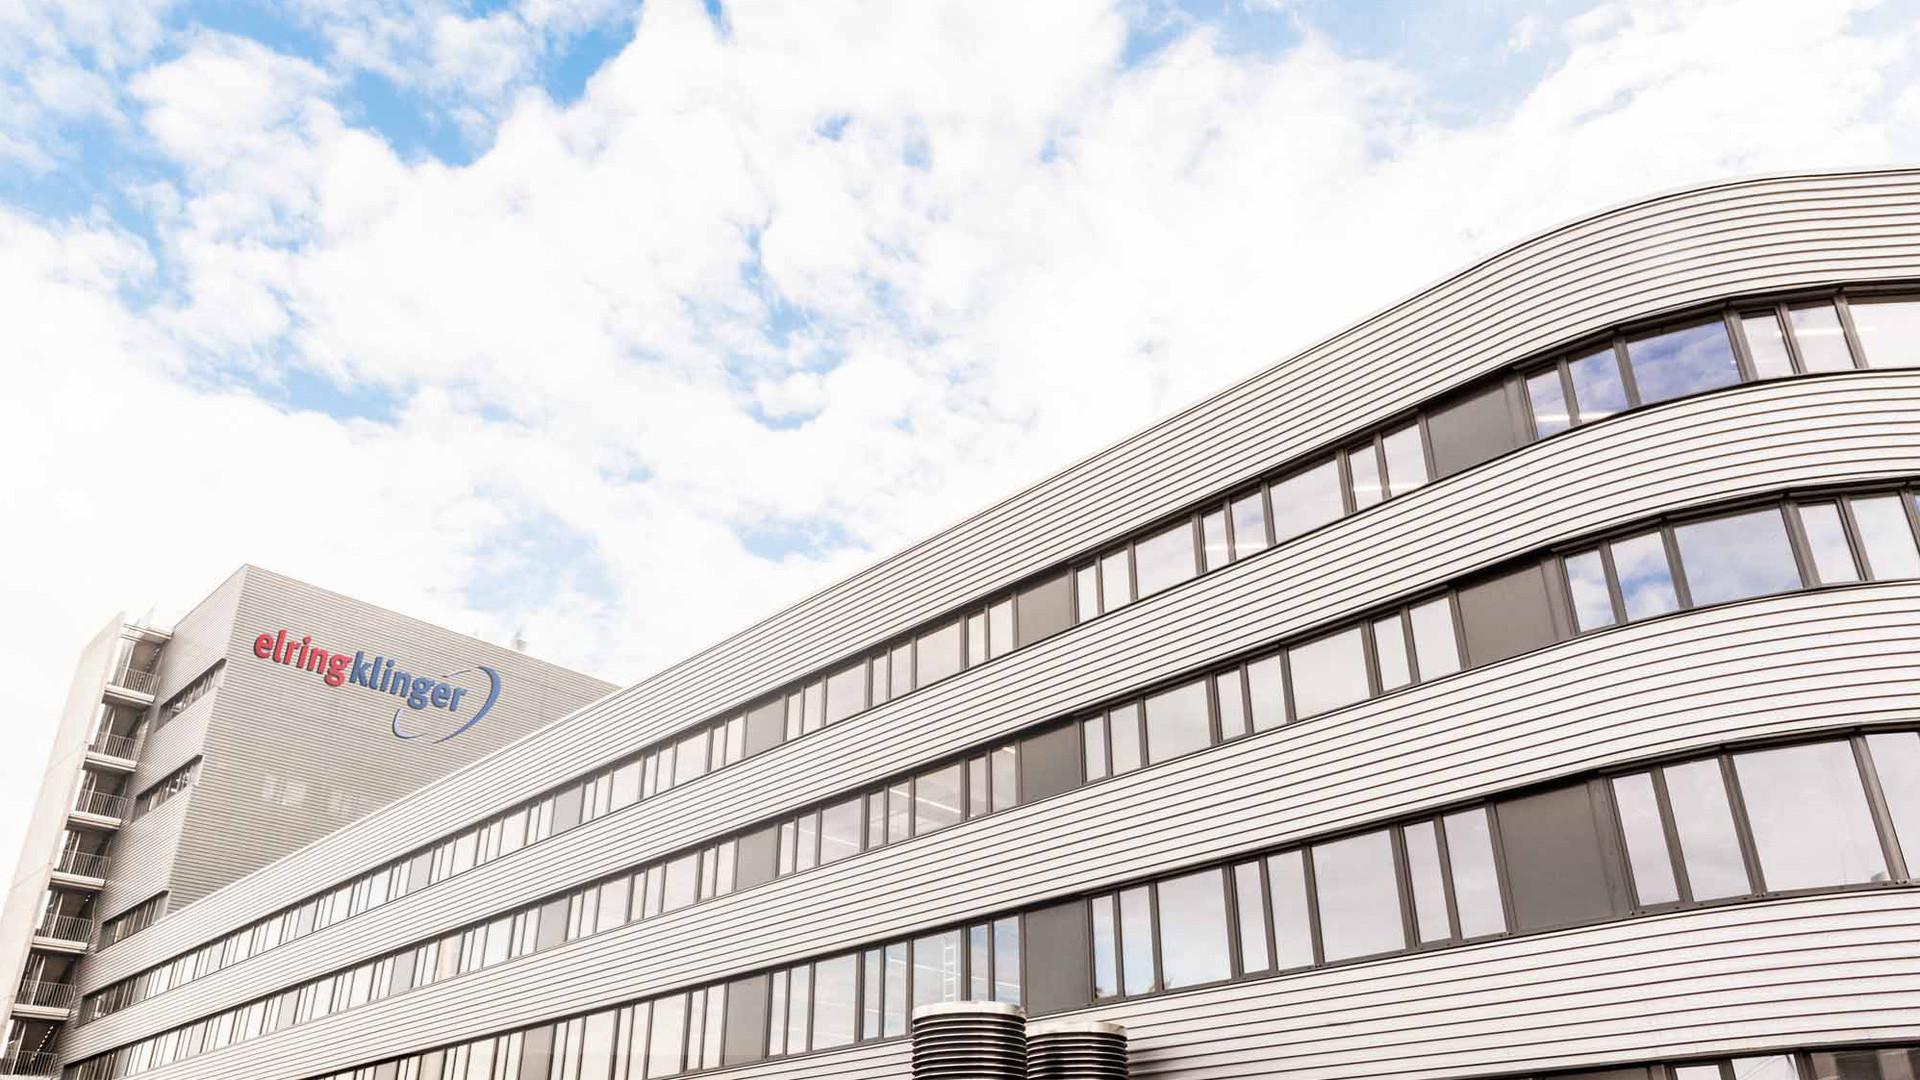 ElringKlinger Kunststofftechnik GmbH Bietigheim-Bissingen nuovo edificio di produzione